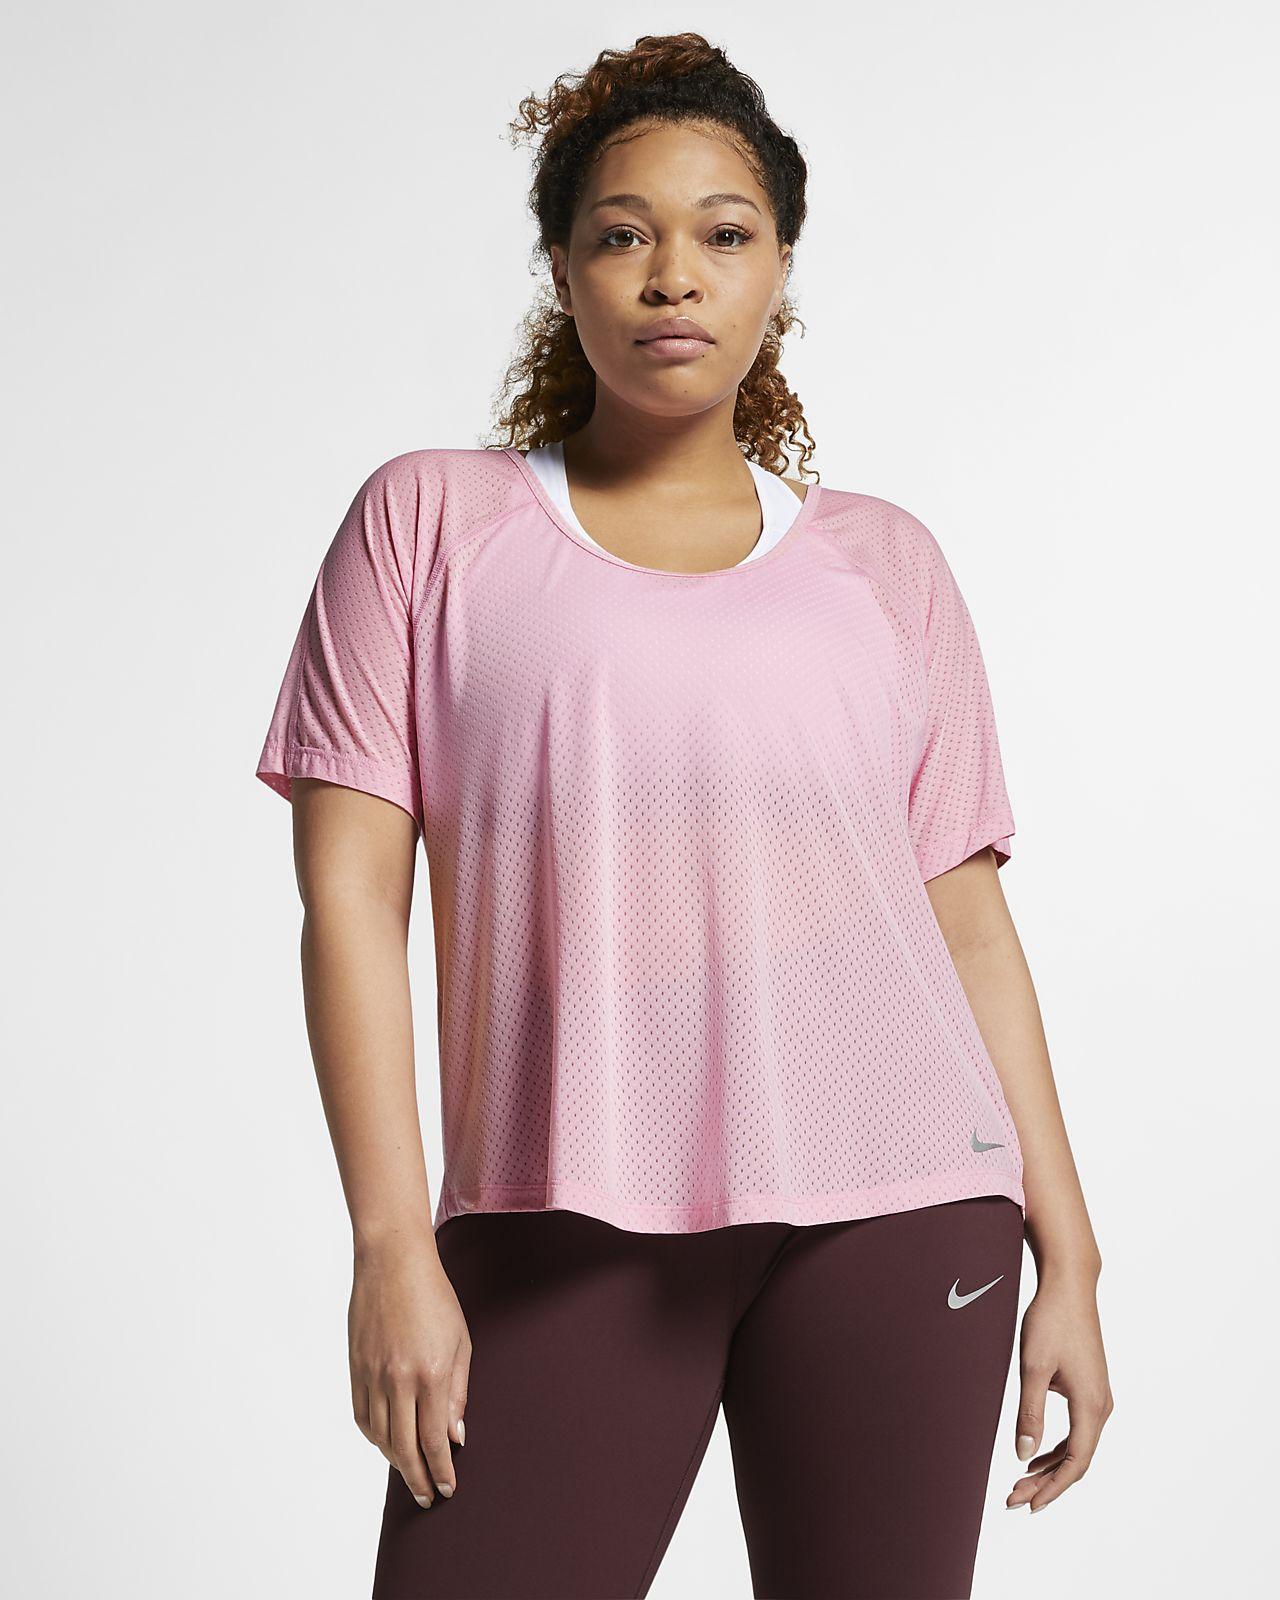 Nike Breathe Miler Camiseta de tirantes de running (Talla grande) - Mujer